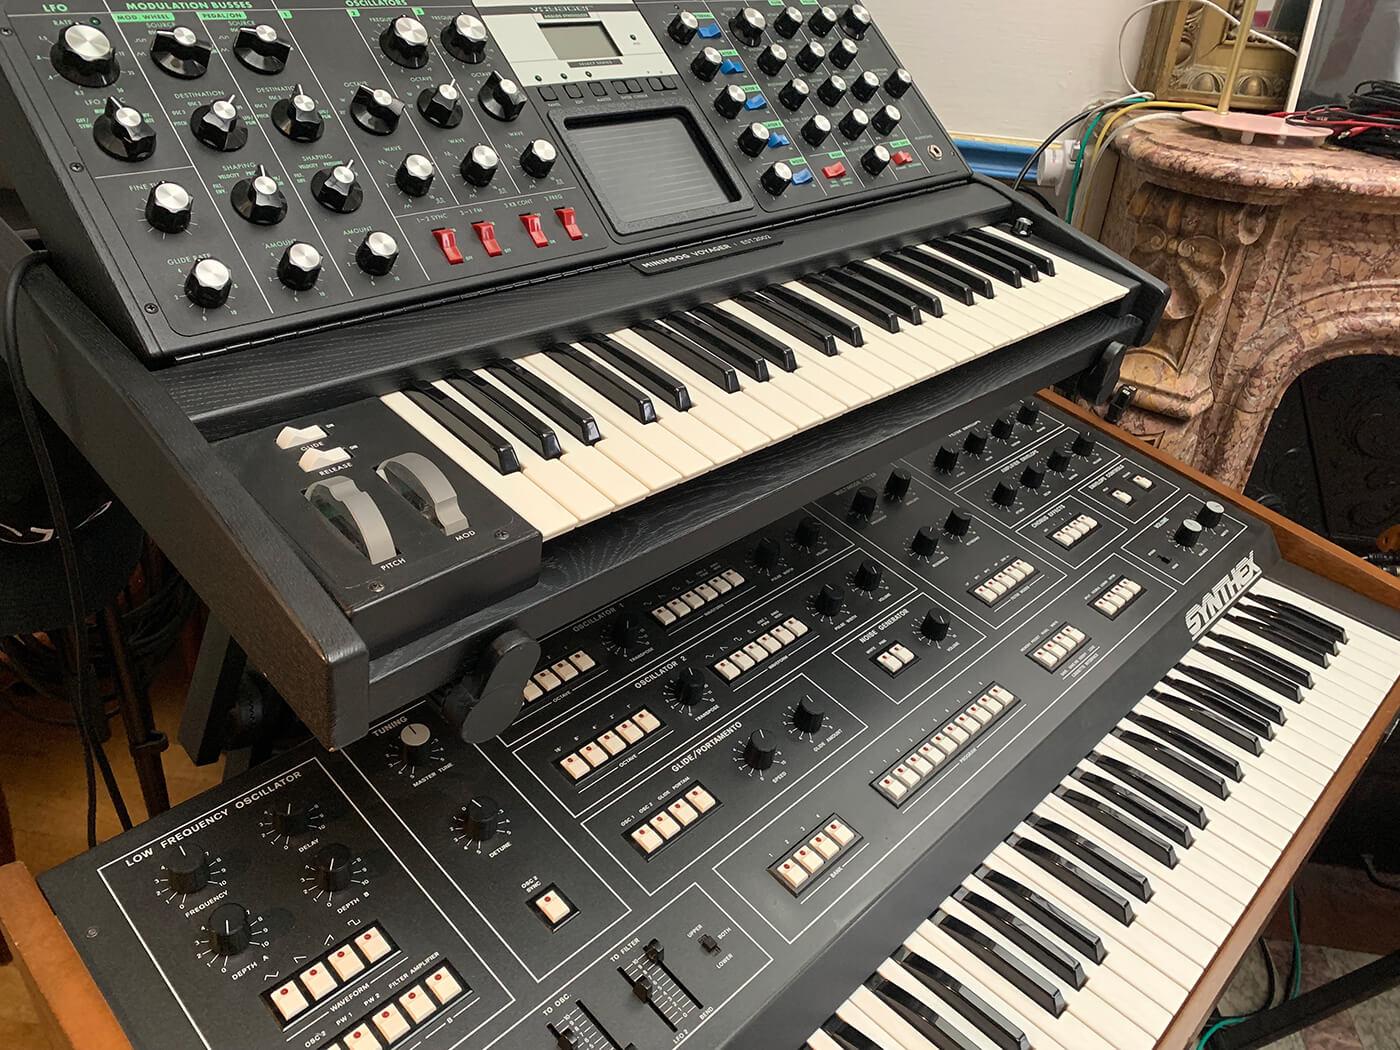 Rodriguez Jr's Elka Synthex & MOOG Voyager